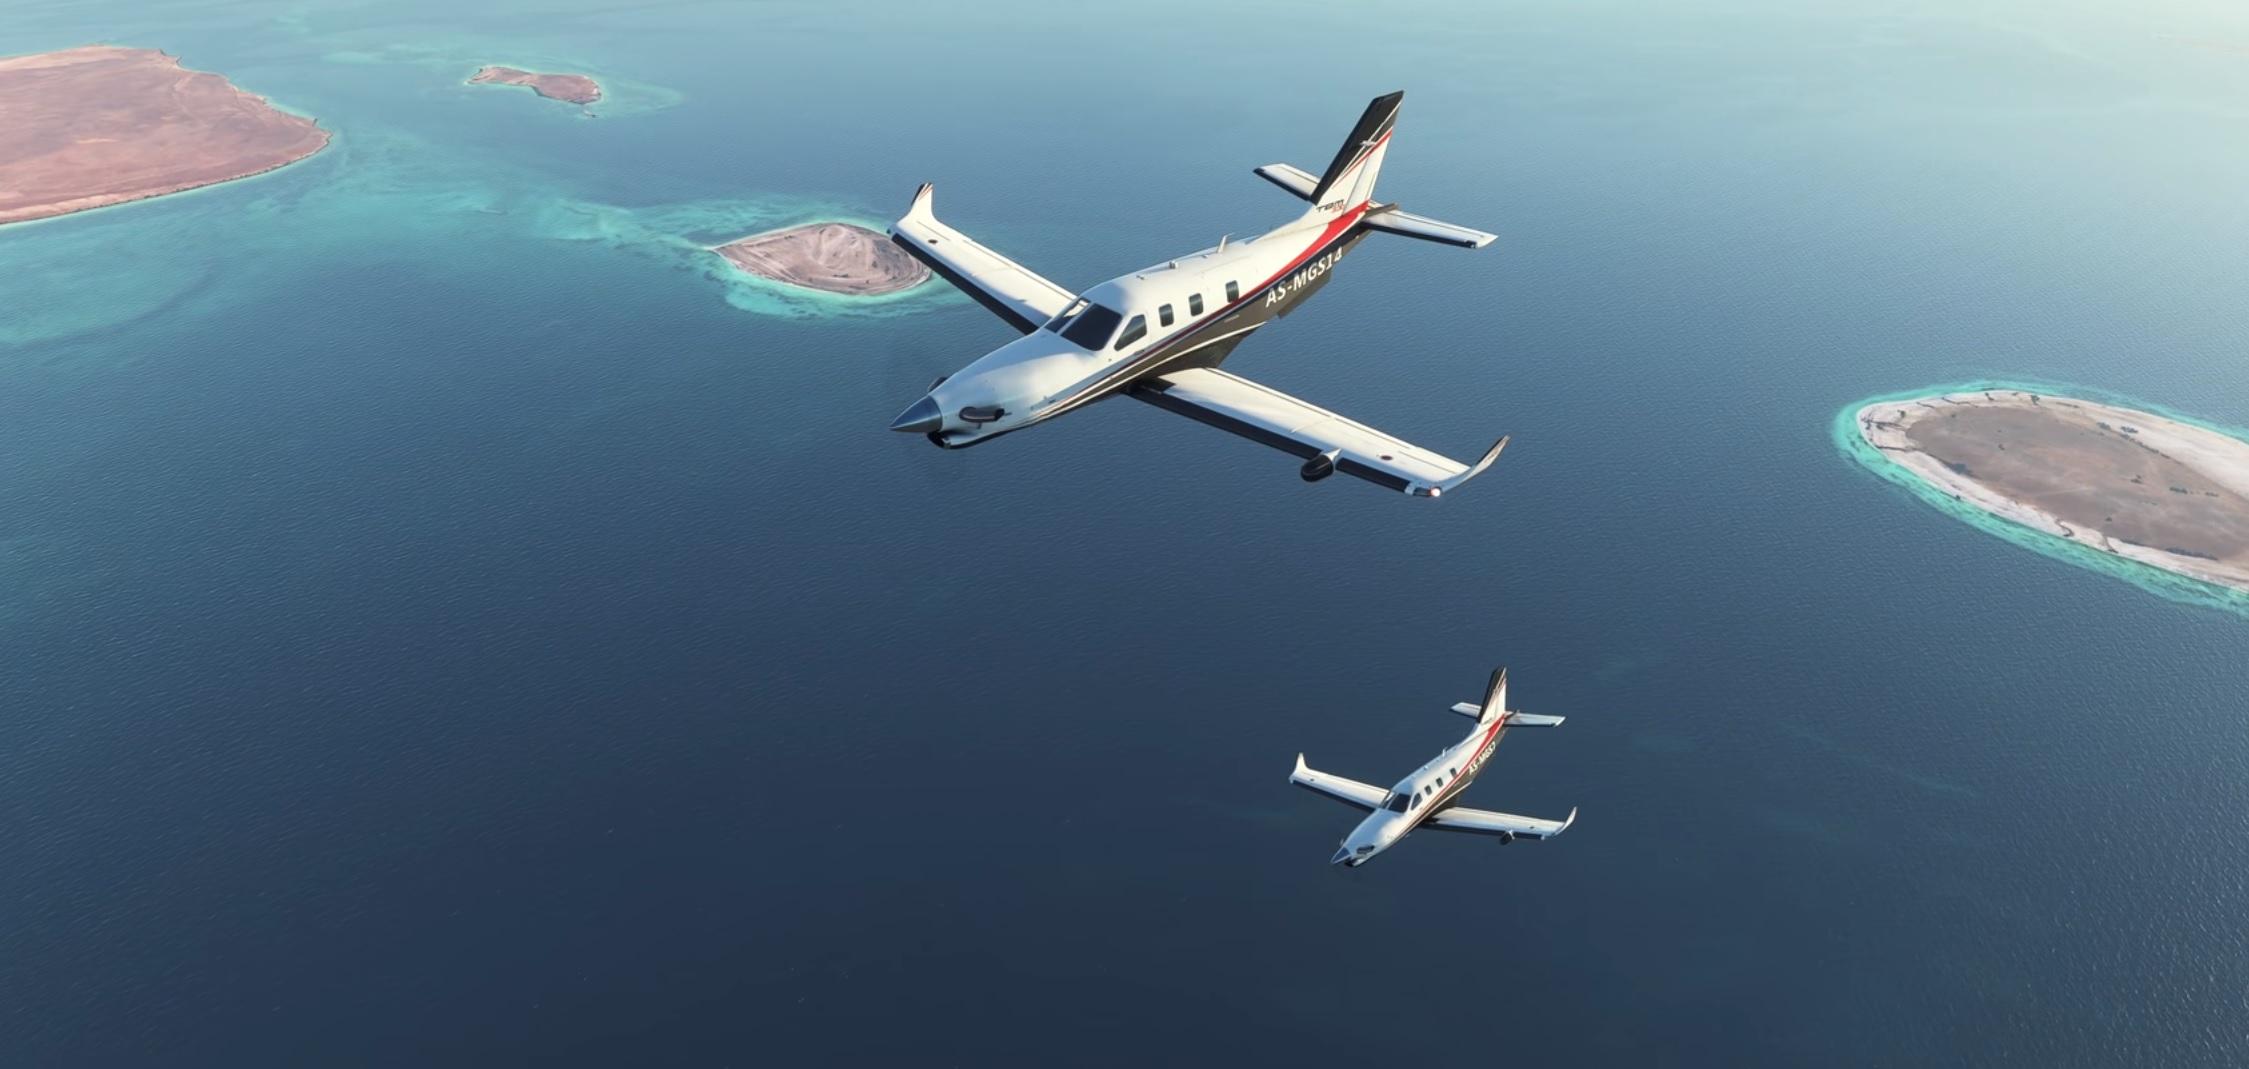 Microsoft wants to bring back Flight Simulator to show it